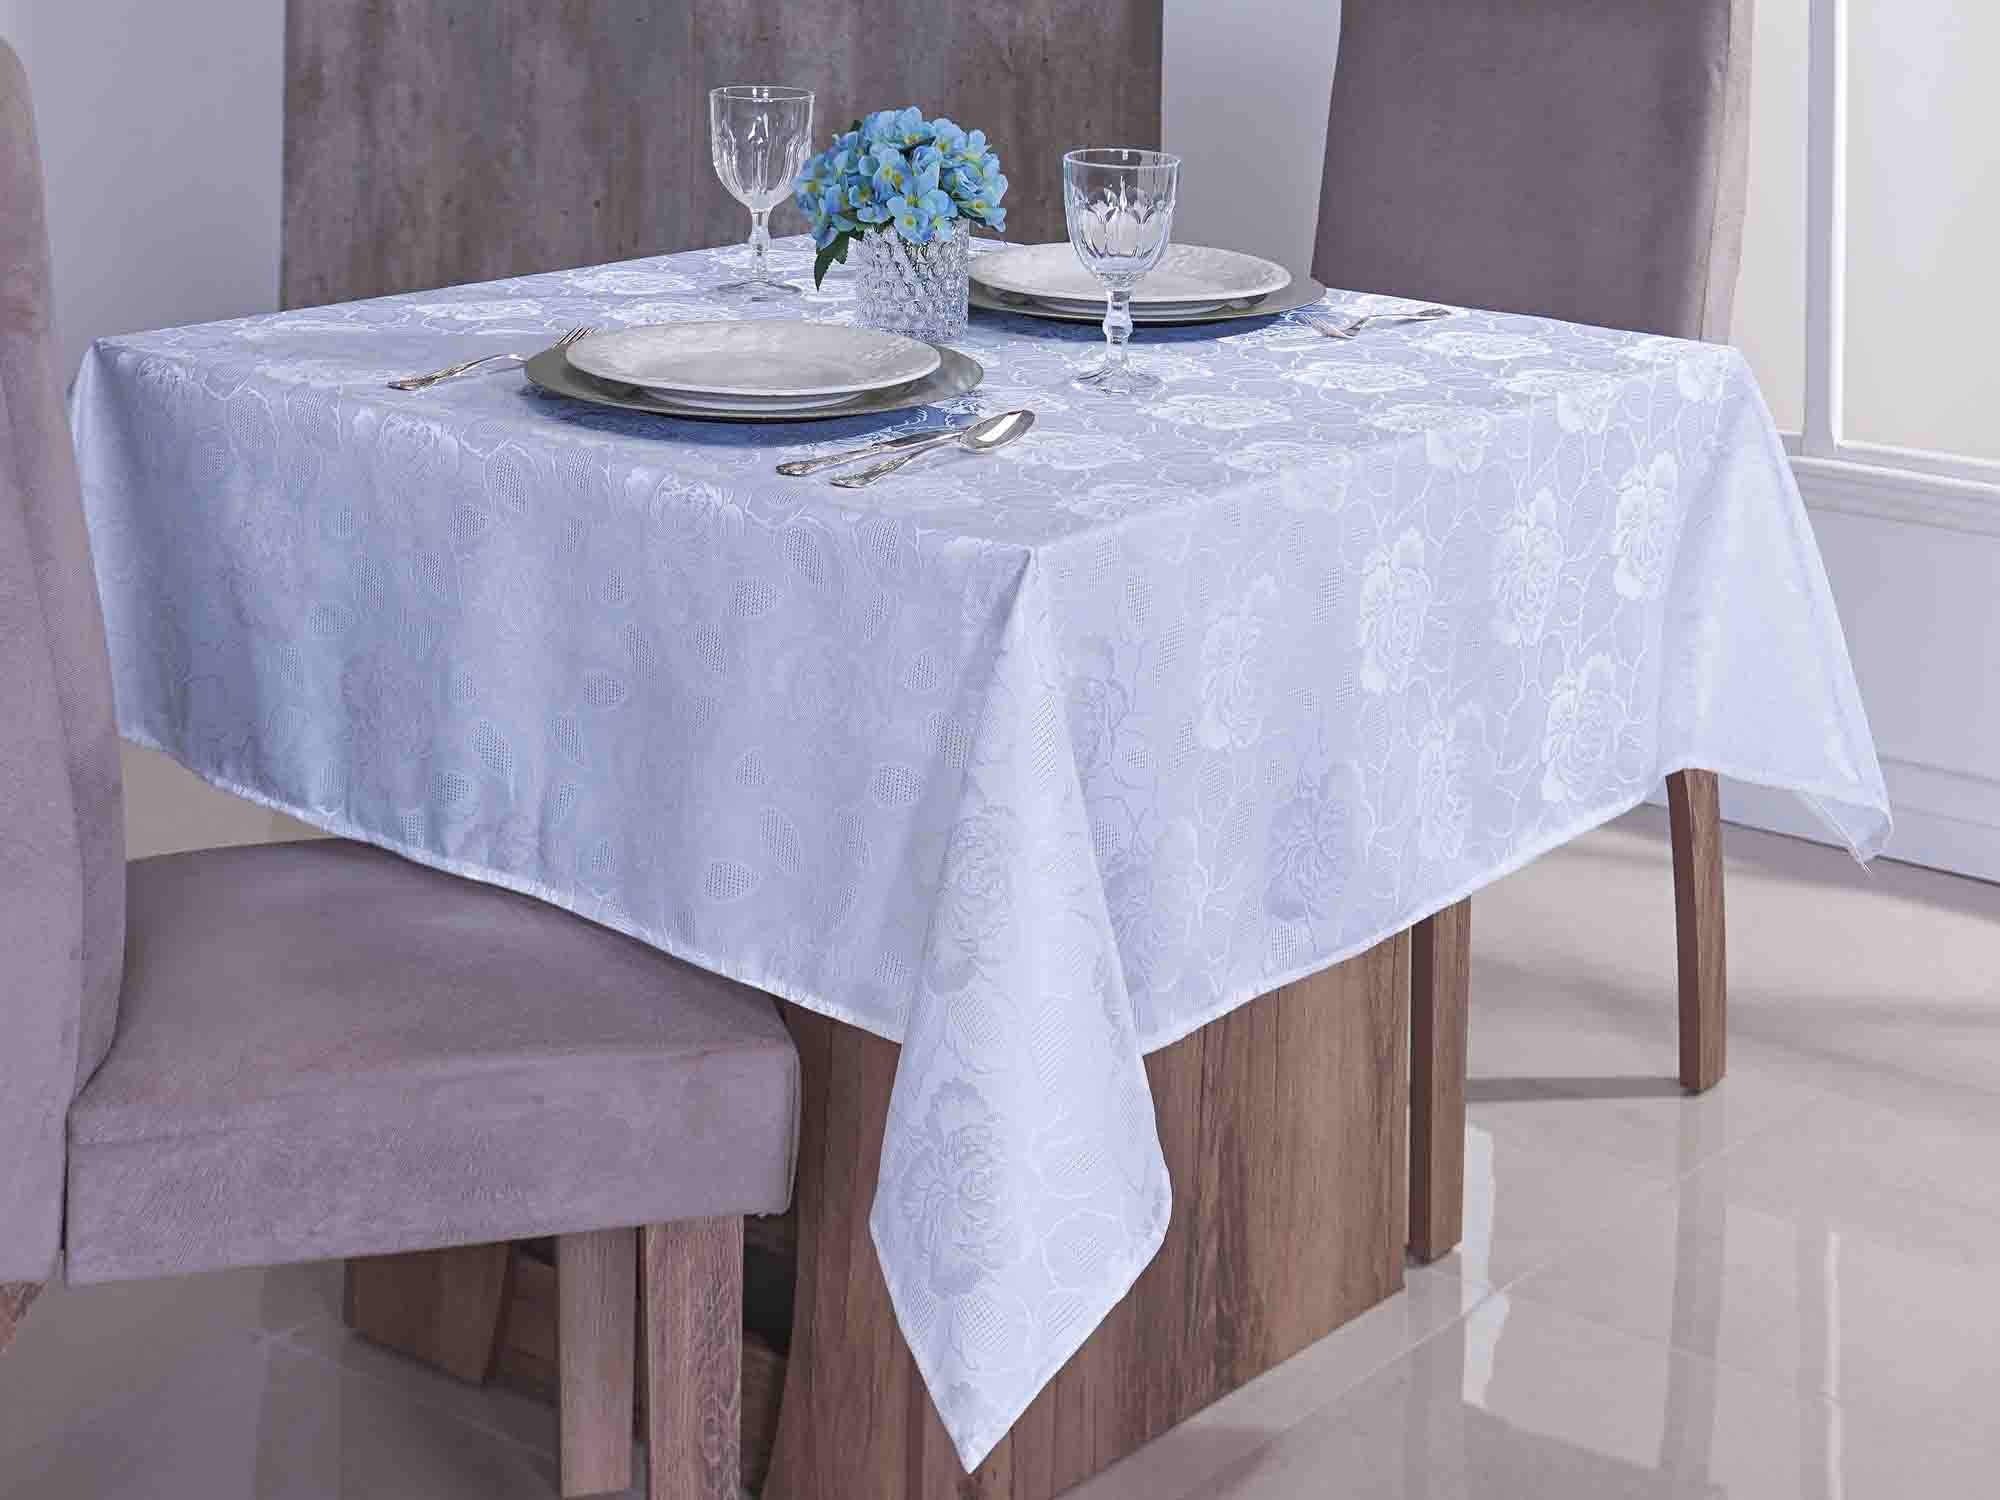 Toalha De Mesa Retangular Glamour Jacquard  - 8 Lugares